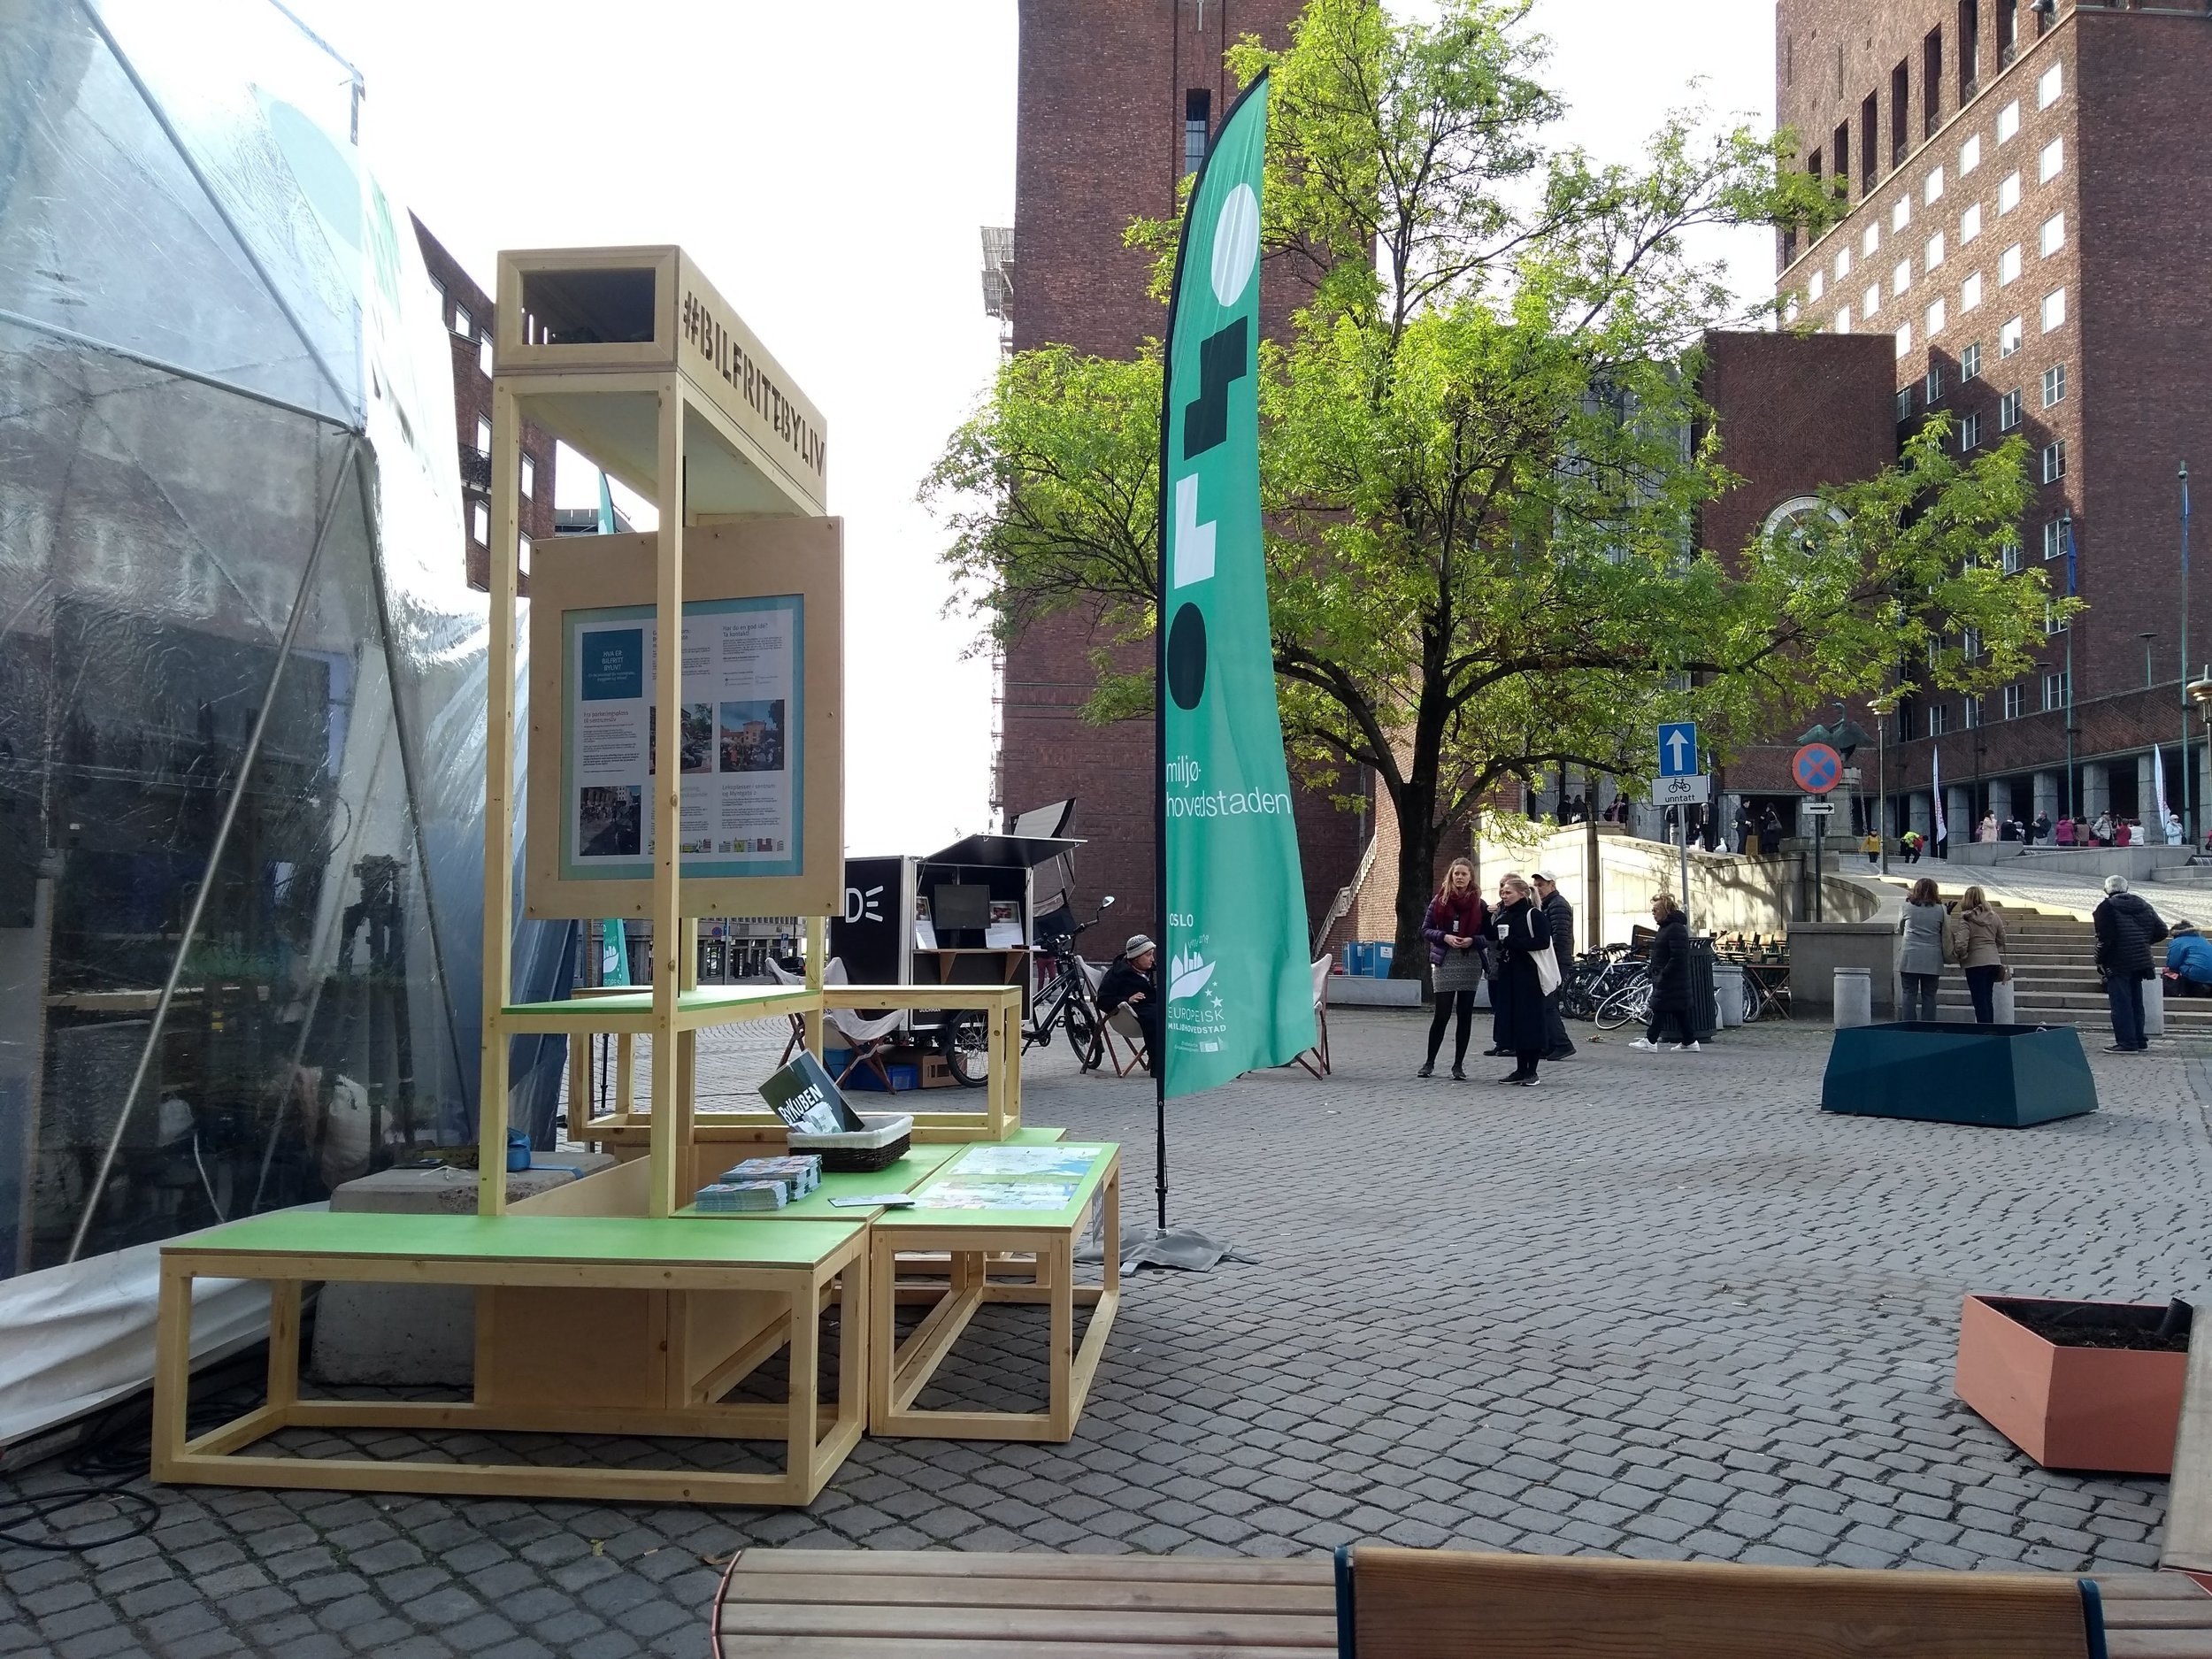 Oslo Green Capital of Europe